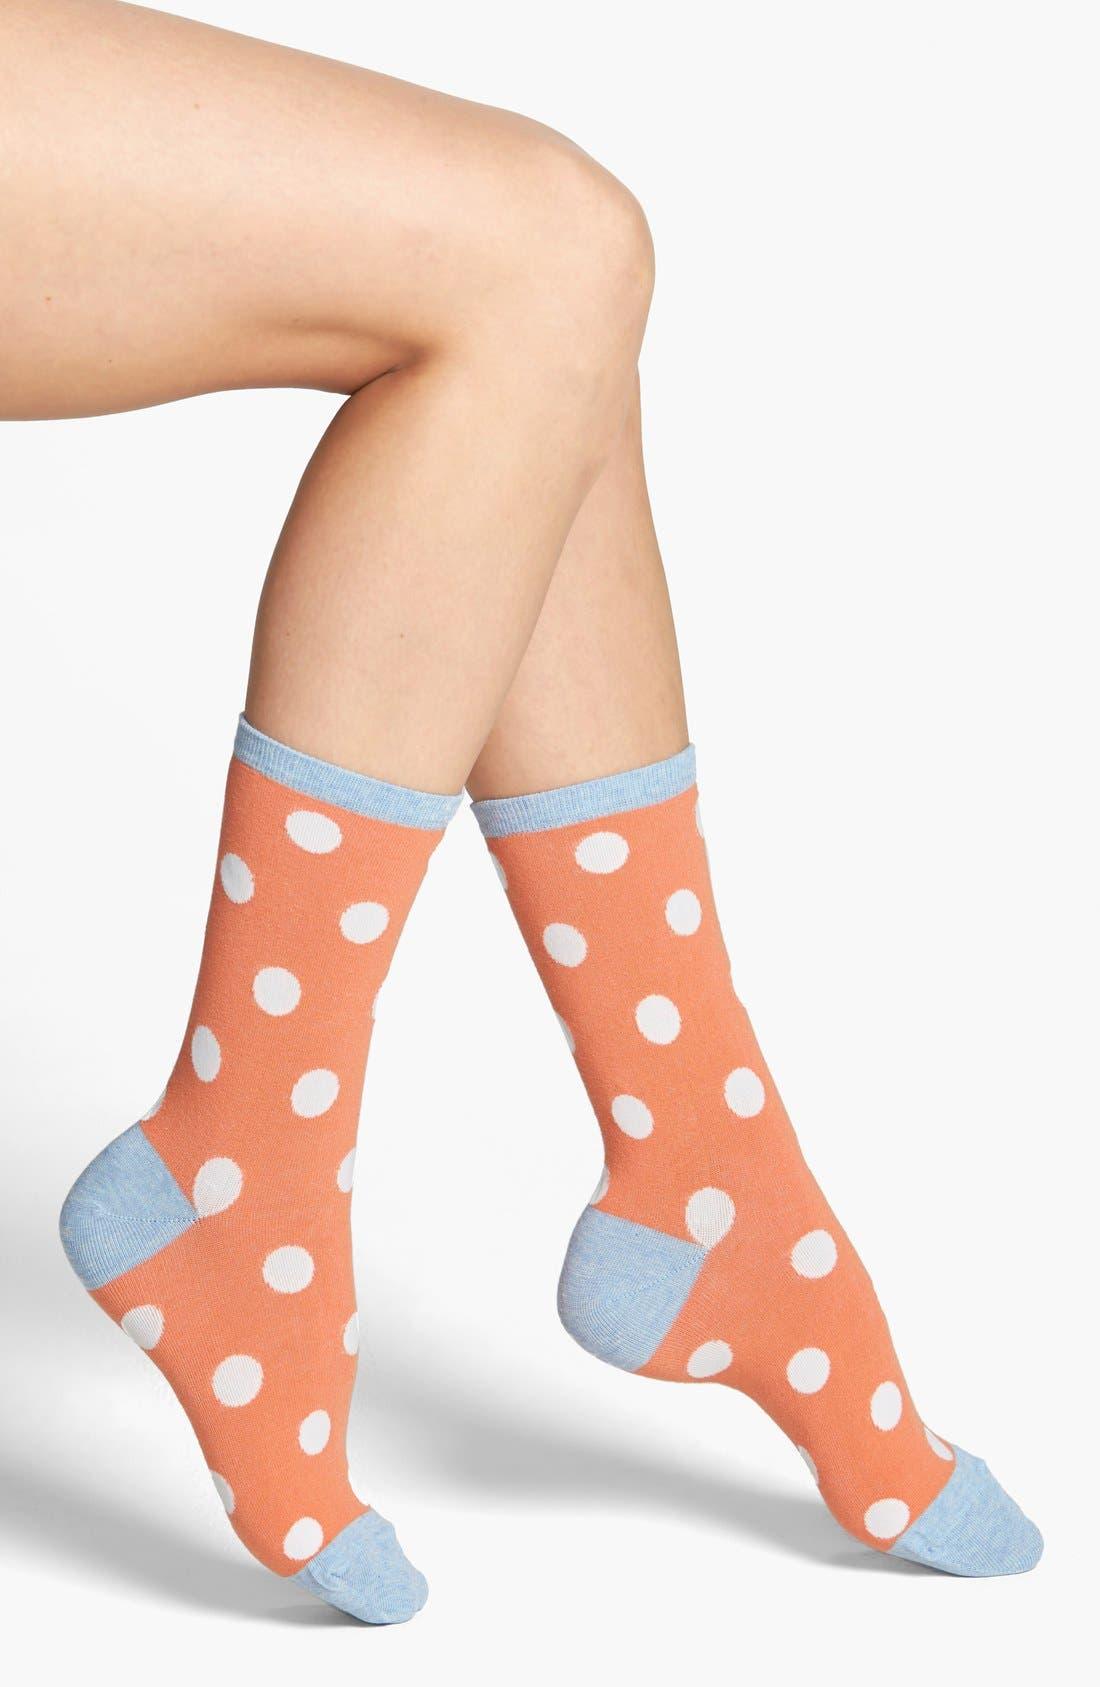 Alternate Image 1 Selected - Hot Sox 'Large Dot' Crew Socks